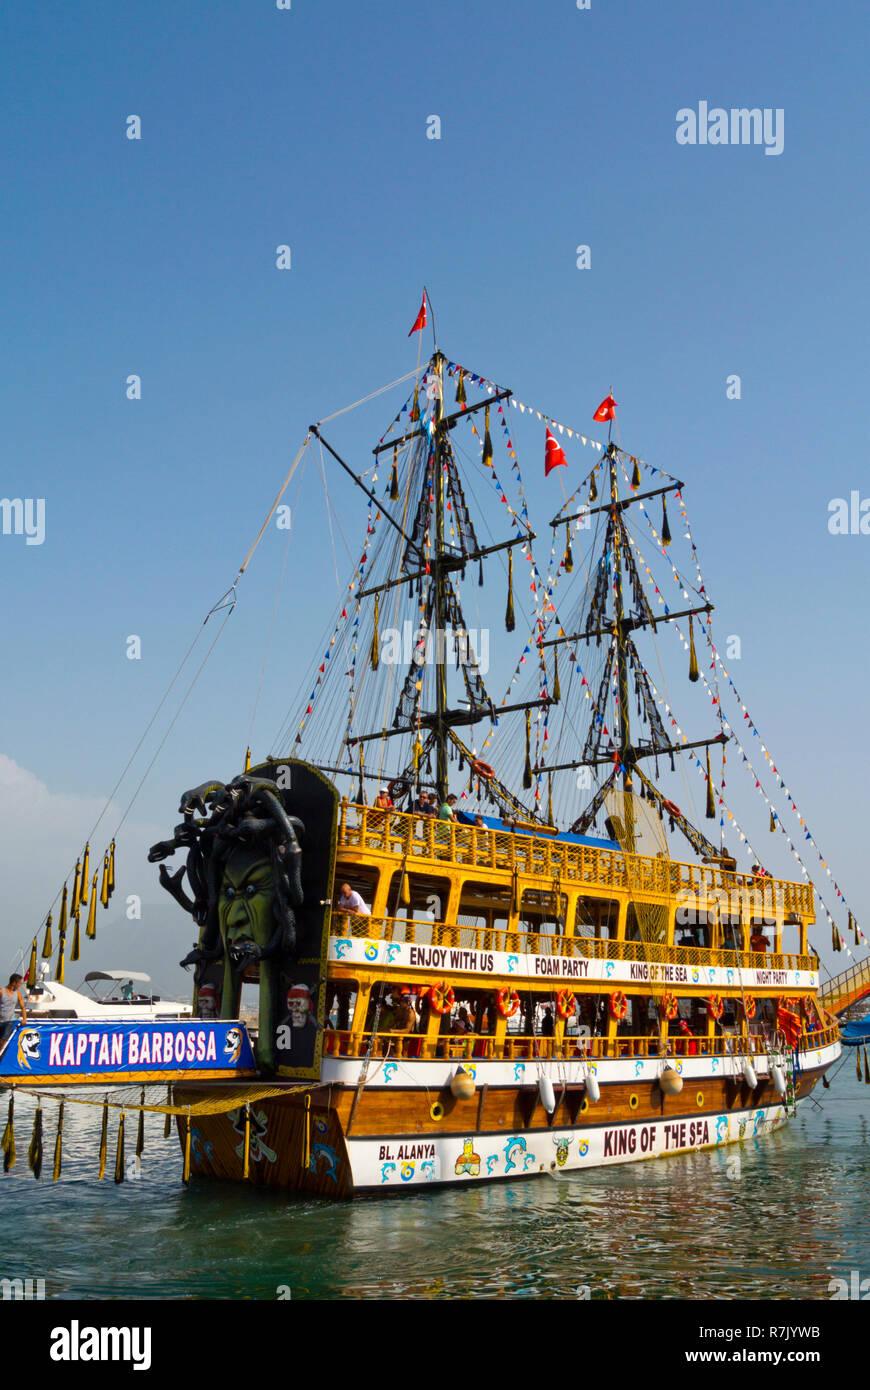 Pirate ship, Alanya, Turkey, Eurasia - Stock Image